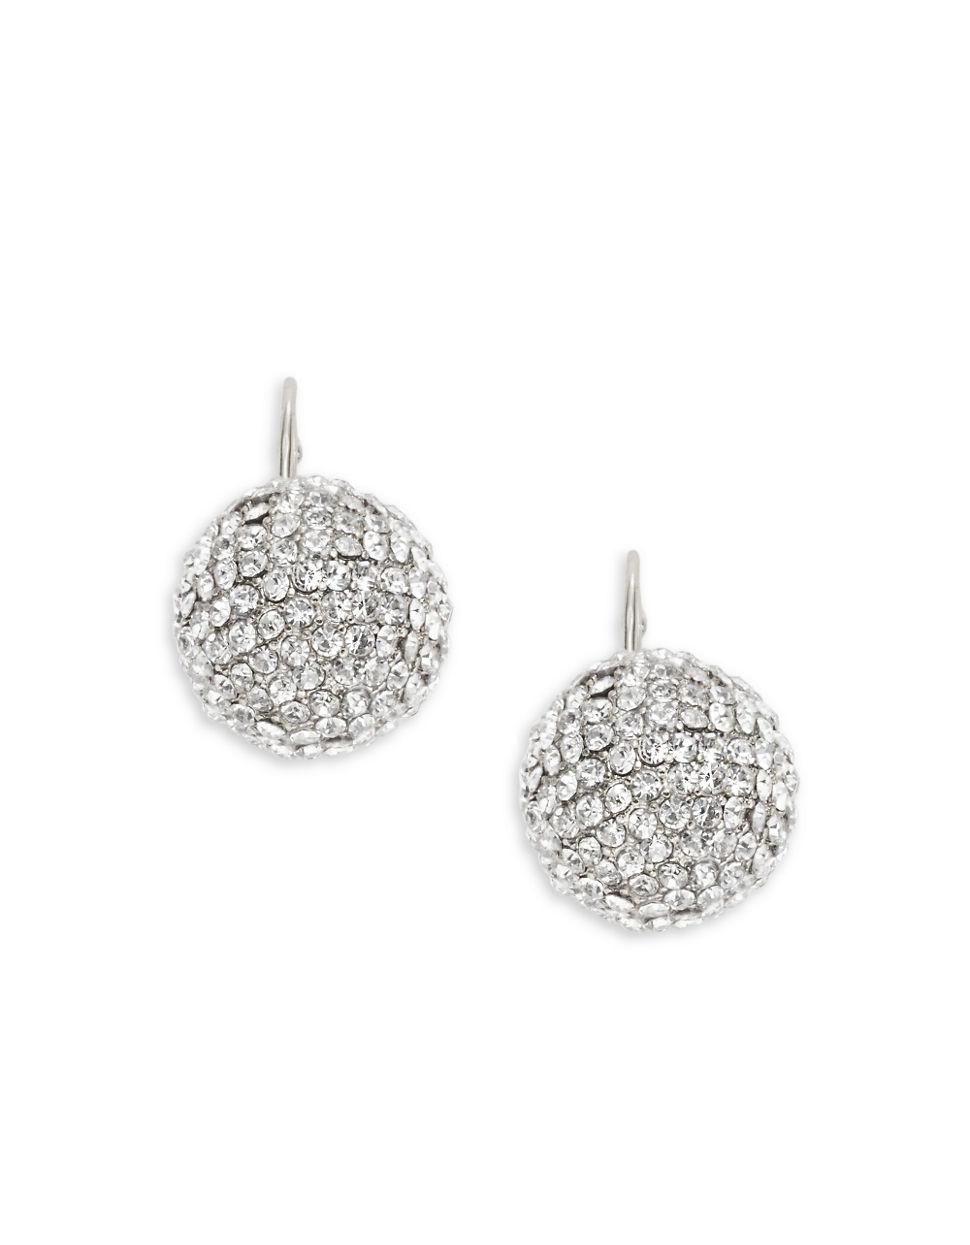 Ball Earring Polyvore Source · Pave Diamond Ball Earrings Topearrings